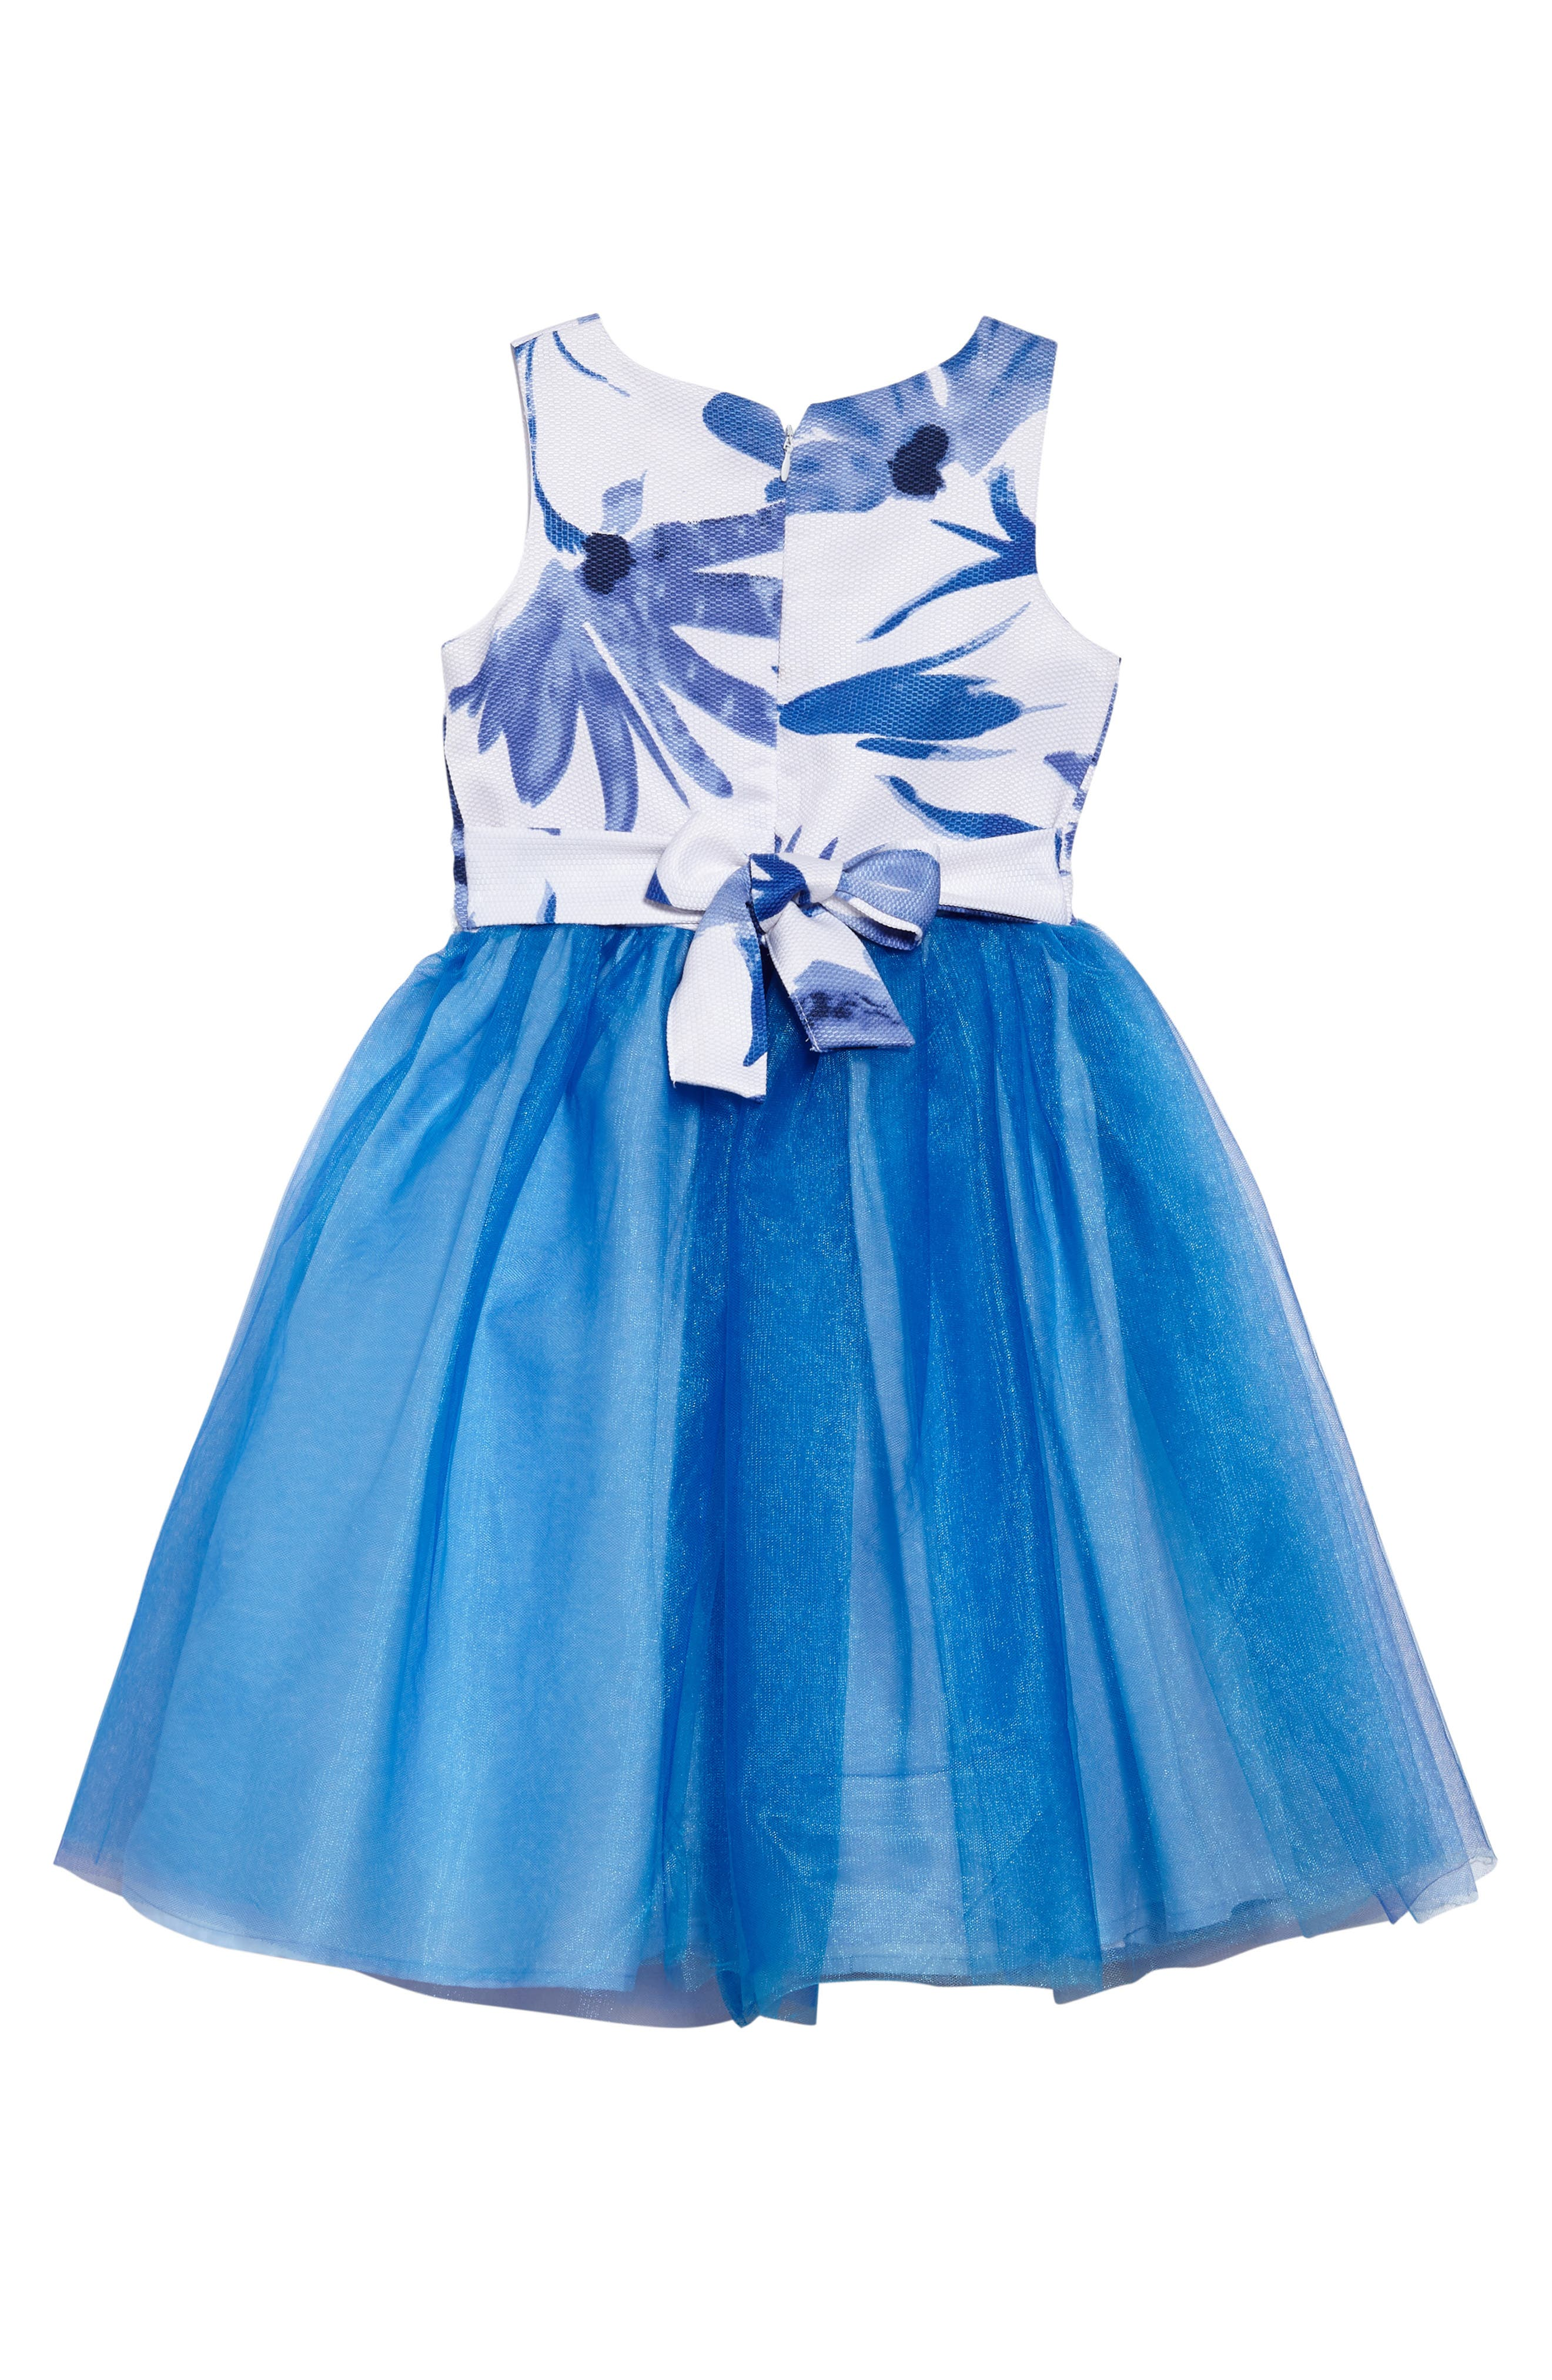 Kathy Sleeveless Dress,                             Alternate thumbnail 2, color,                             Blue/ White